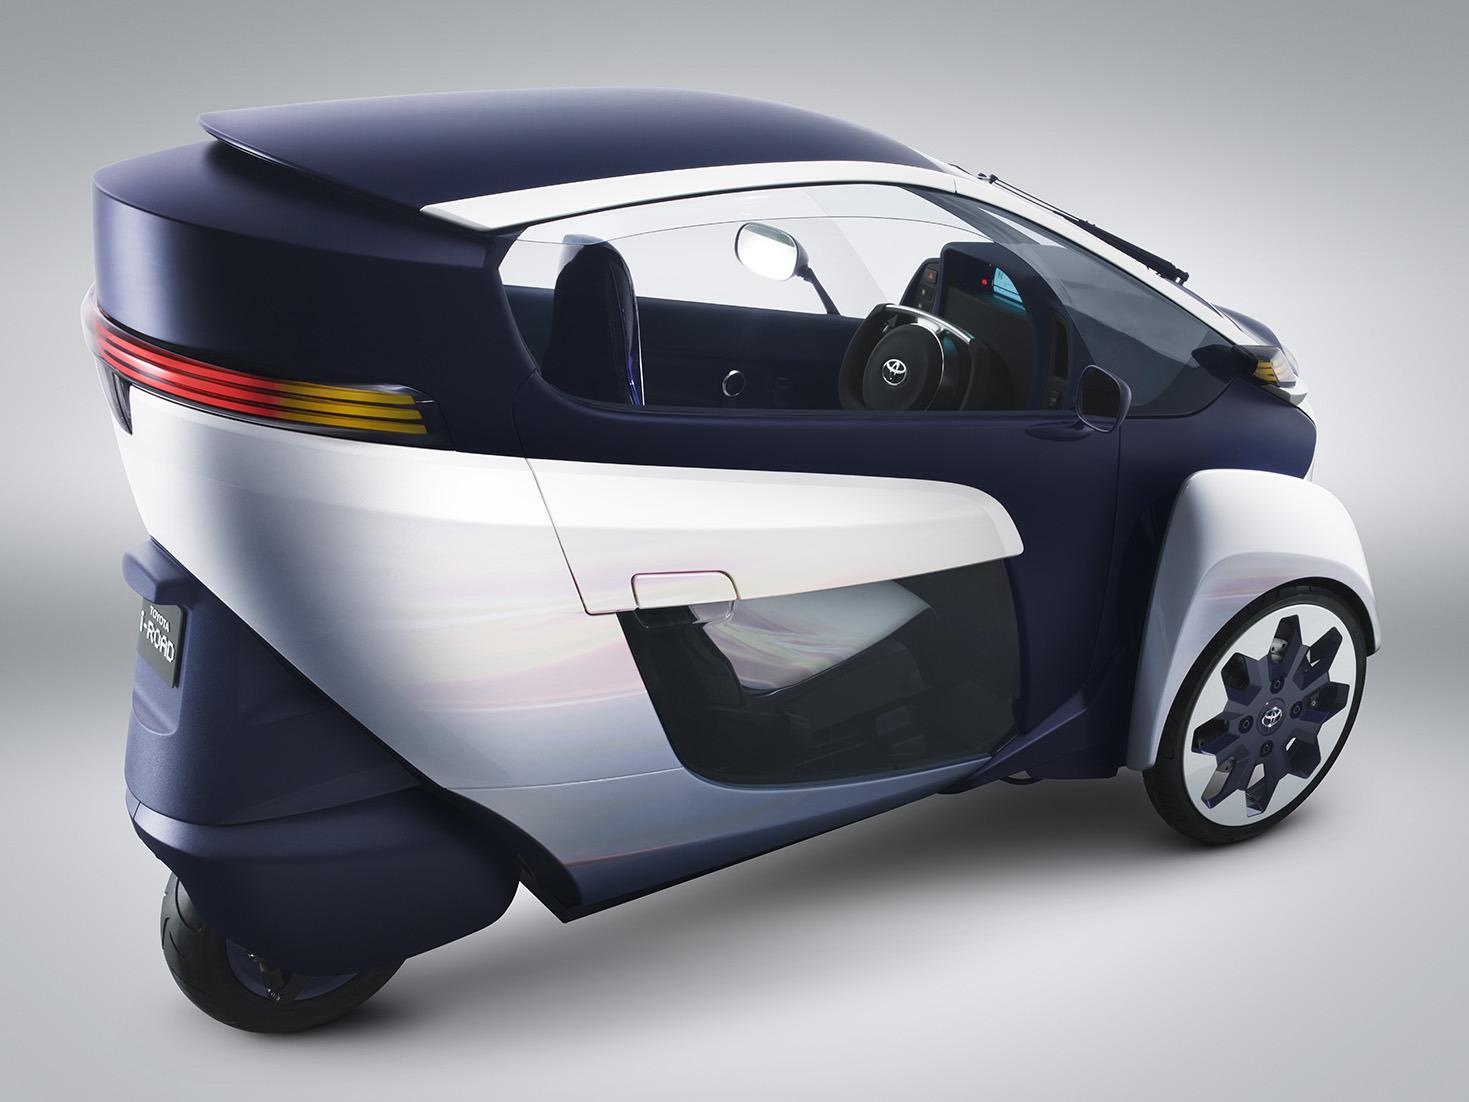 toyota-i-road-concept-2013-tokyo-motor-show-001-1